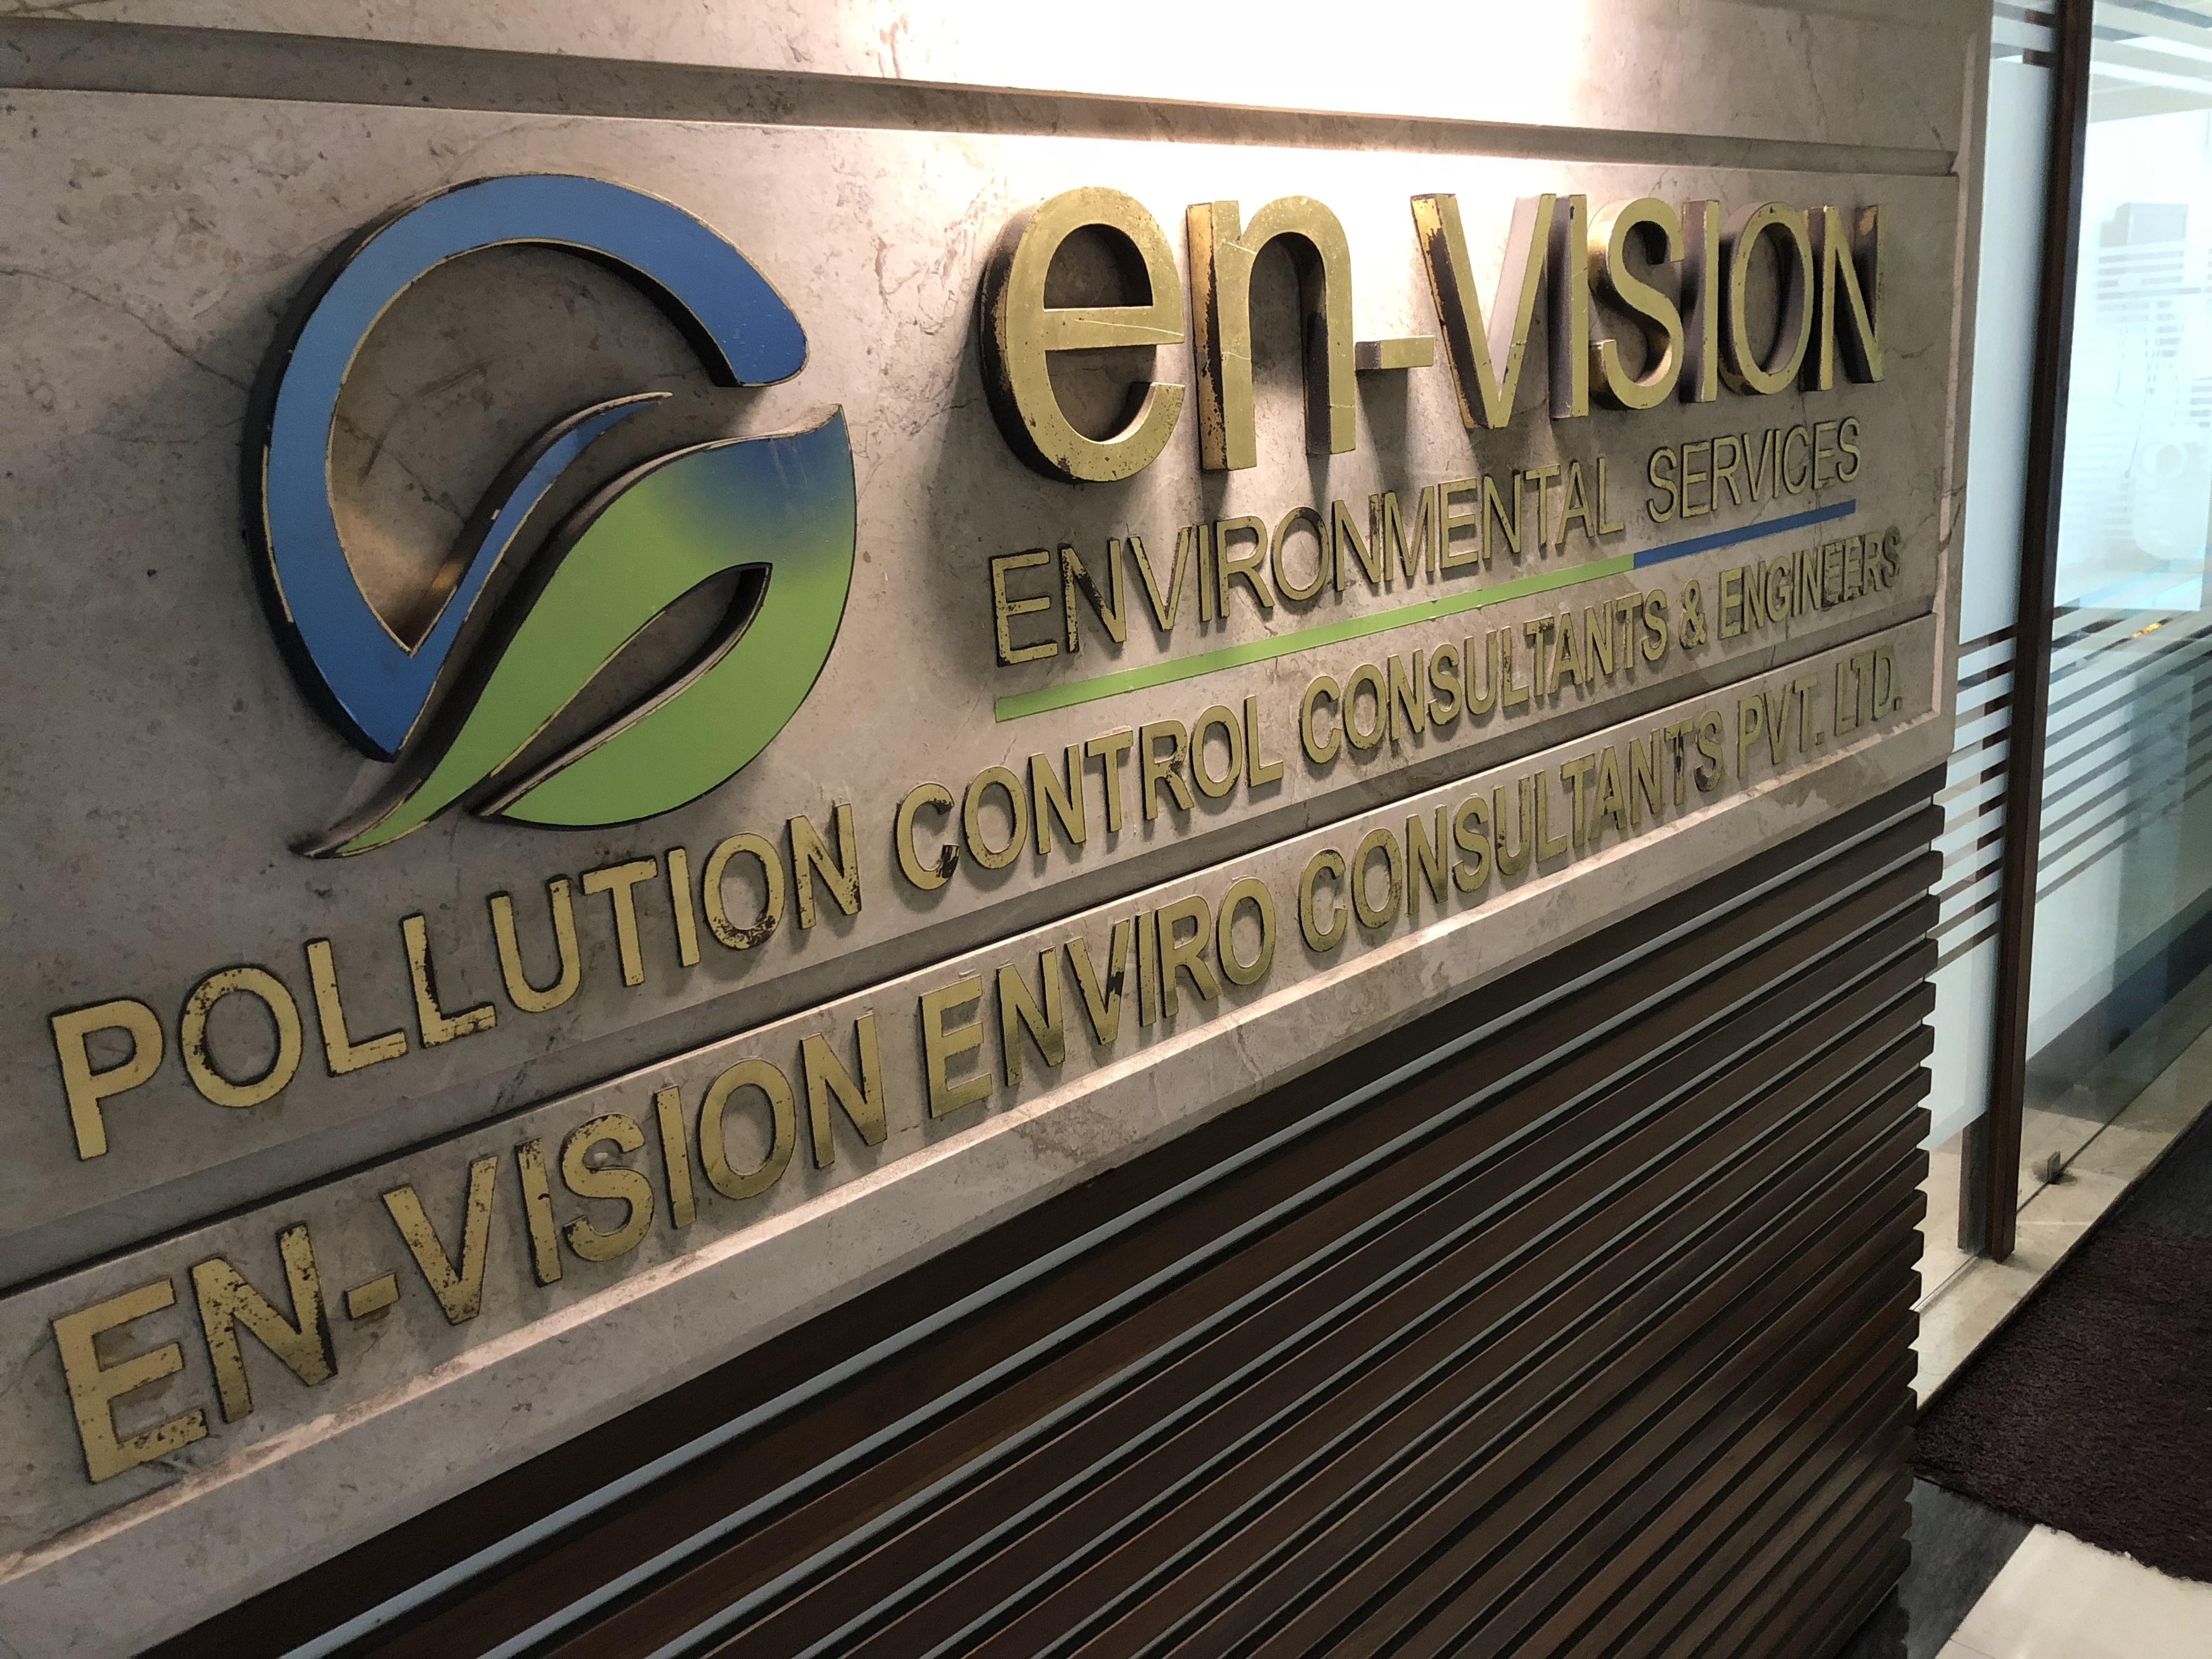 EN-VISION ENVIRONMENTAL SERVICES, INDIA | LinkedIn